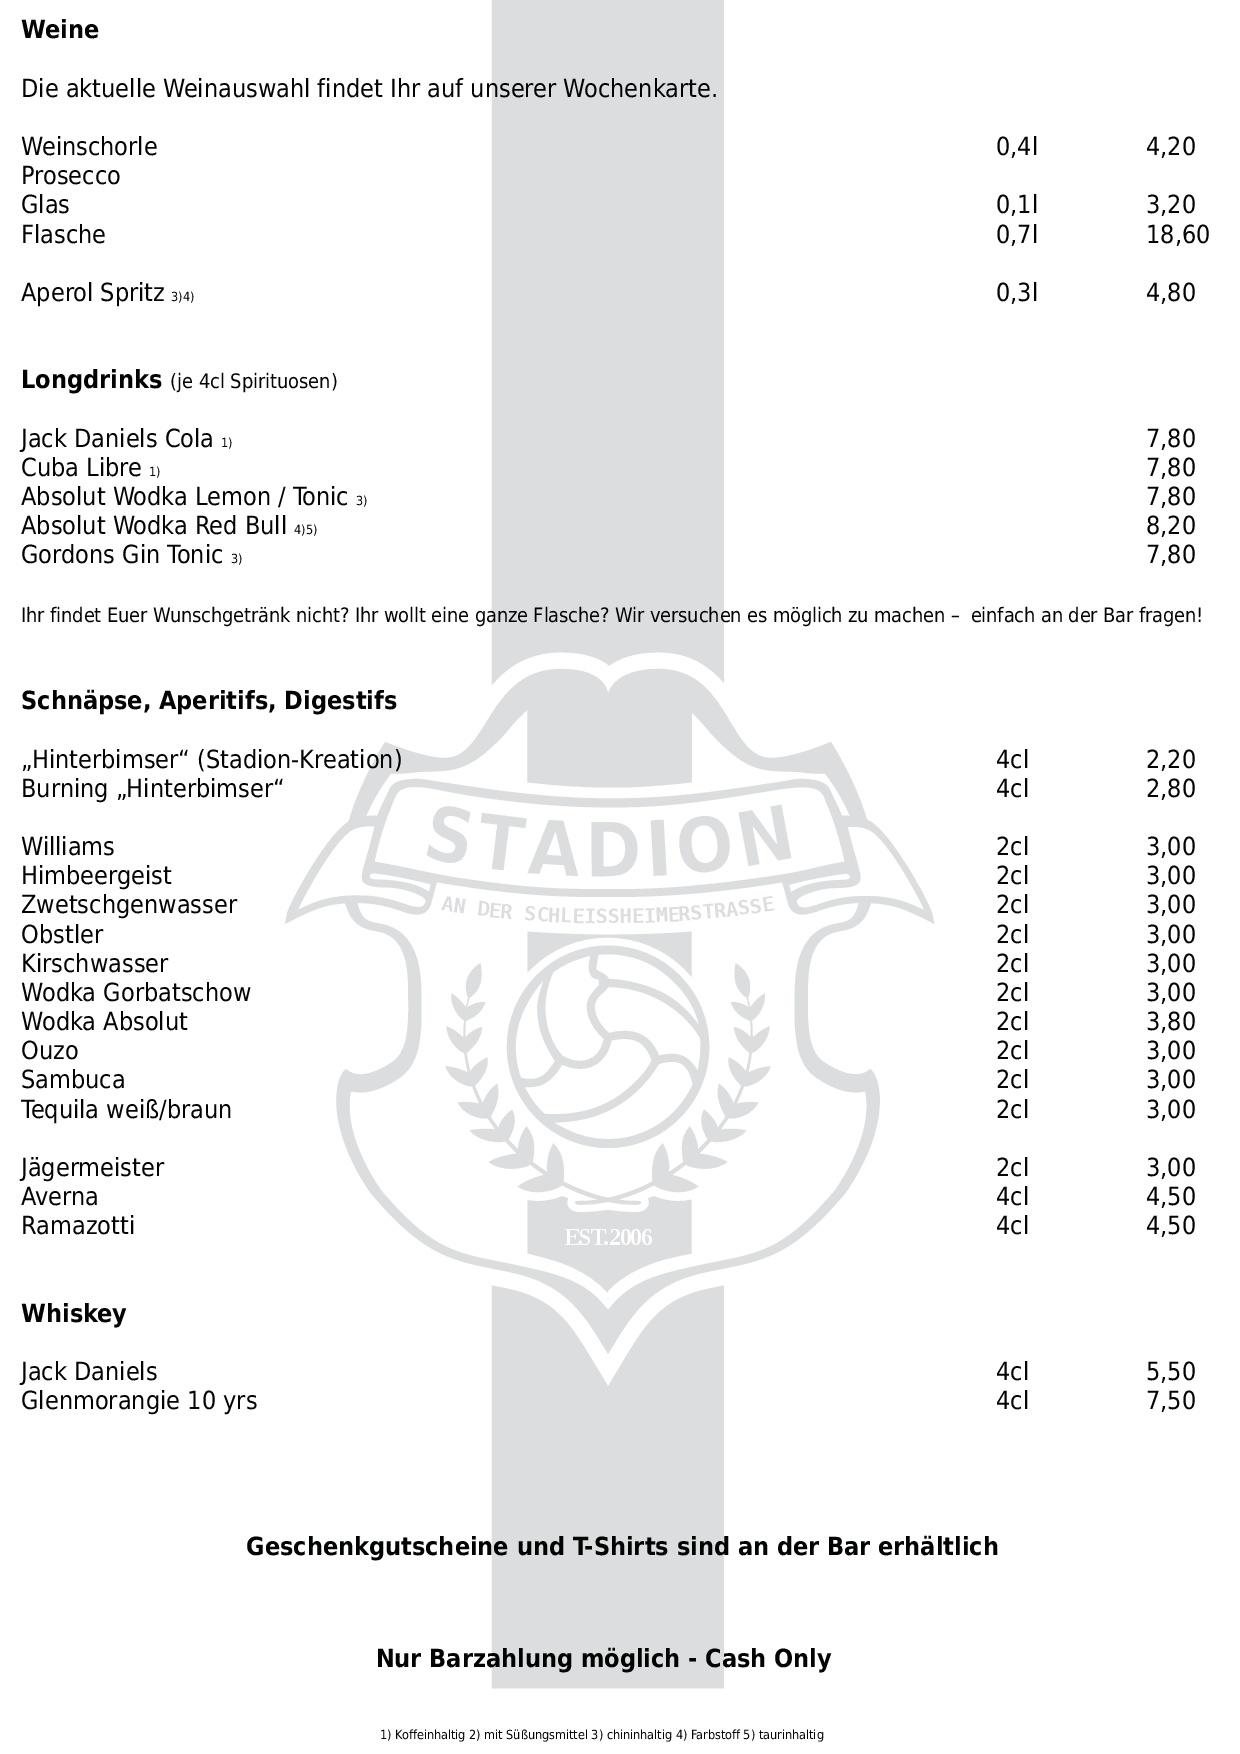 Speisekarte_Stadion_Seite_3_130116_2-1